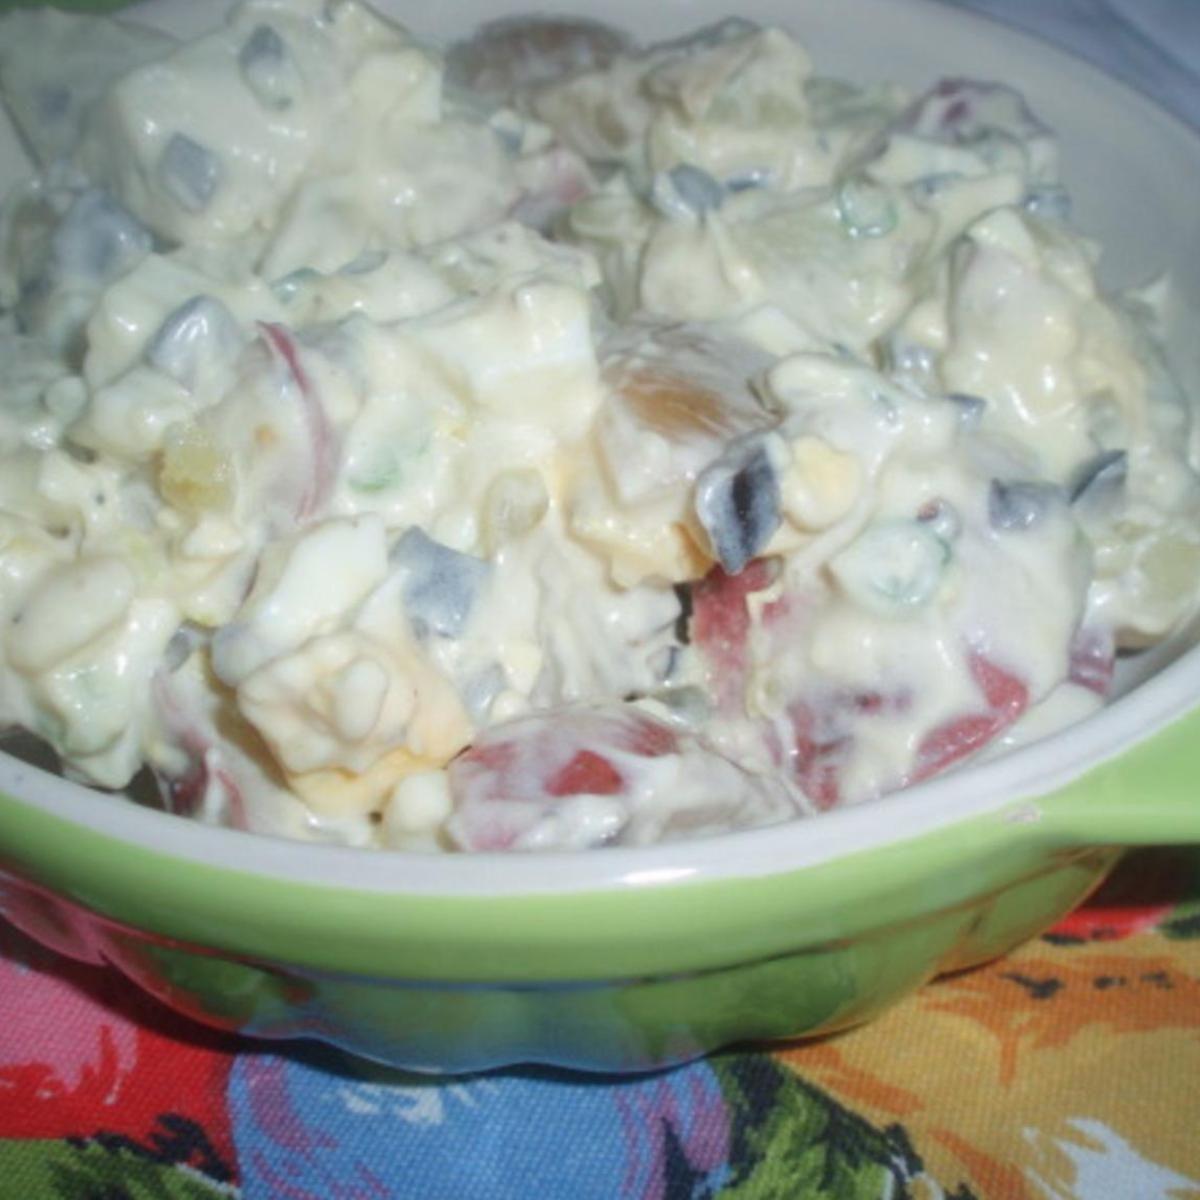 Esther S My Mom Potato Salad Recipe Potato Salad Potatoes Salad Side Dishes